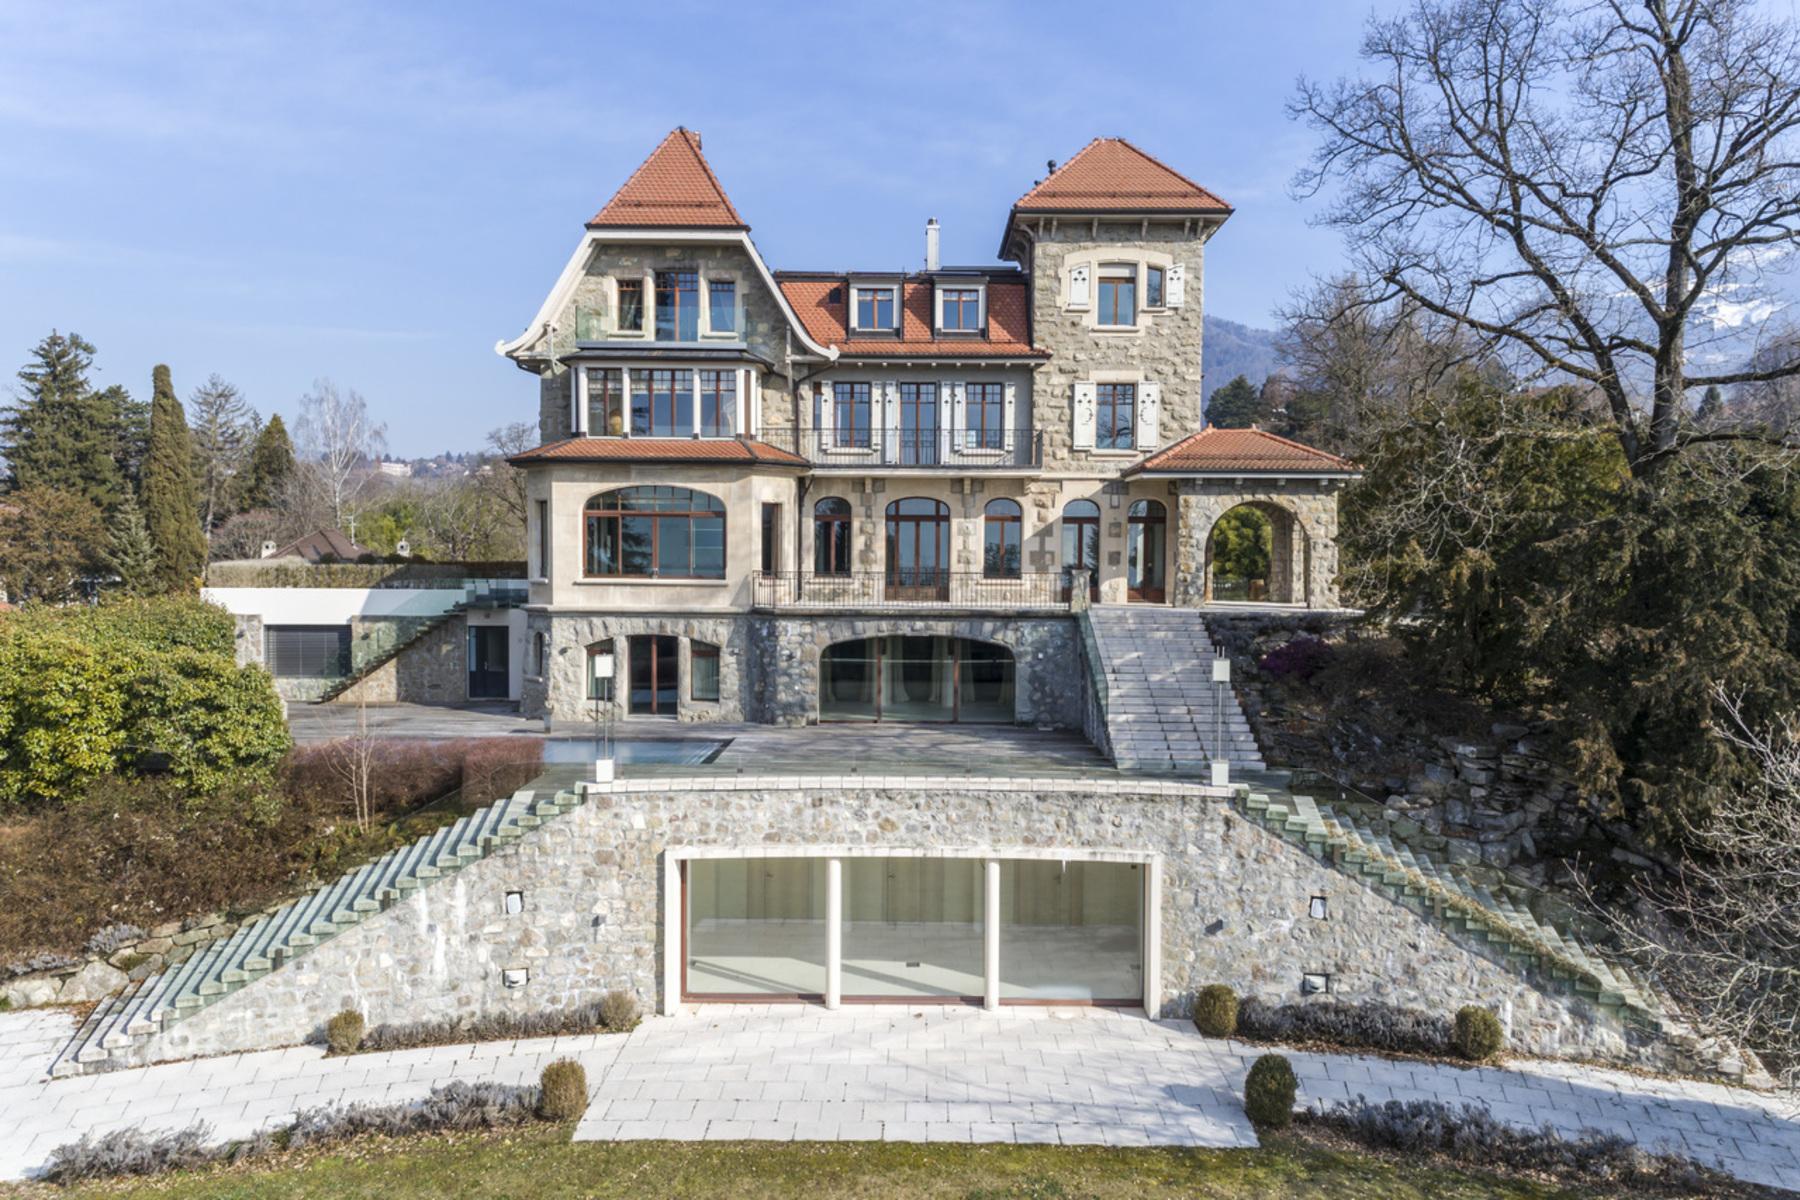 Single Family Home for Active at Sumptuous 14 room mansion Unique views and location Clarens/Montreux Montreux, Vaud 1820 Switzerland